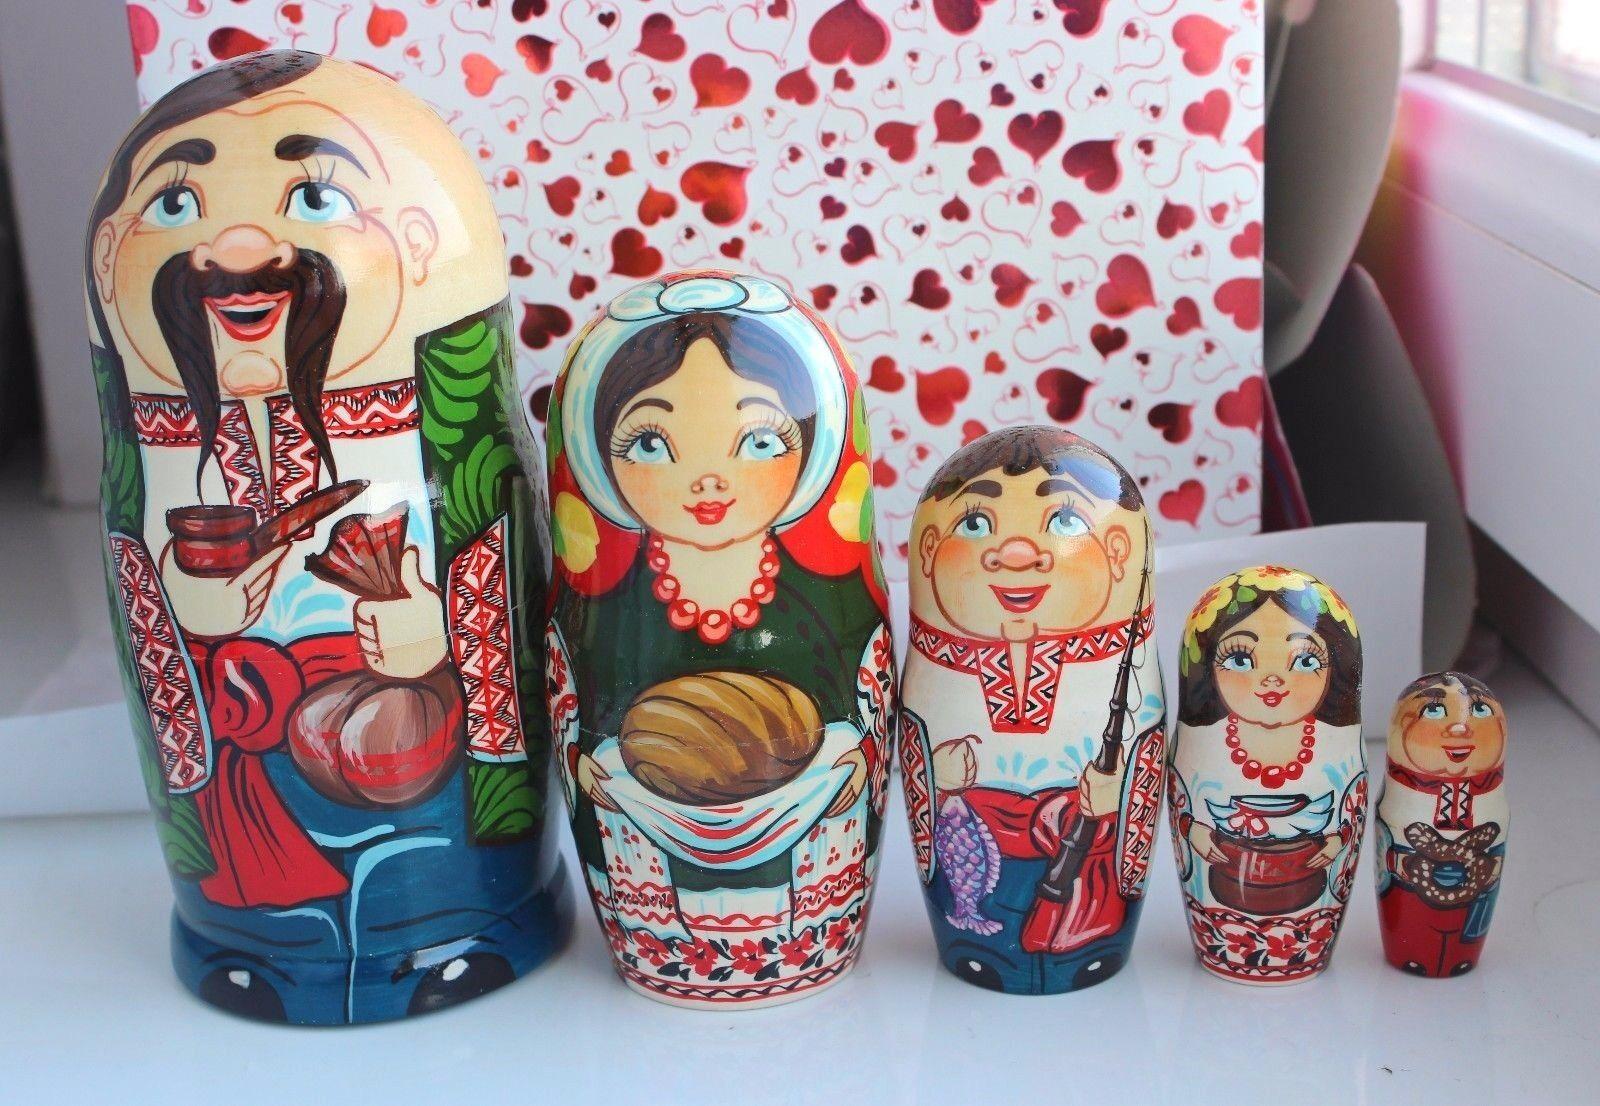 Ukraine Nesting dolls h=16 cm Matryoshka 5pc Ukrainians and nature hand souvenir